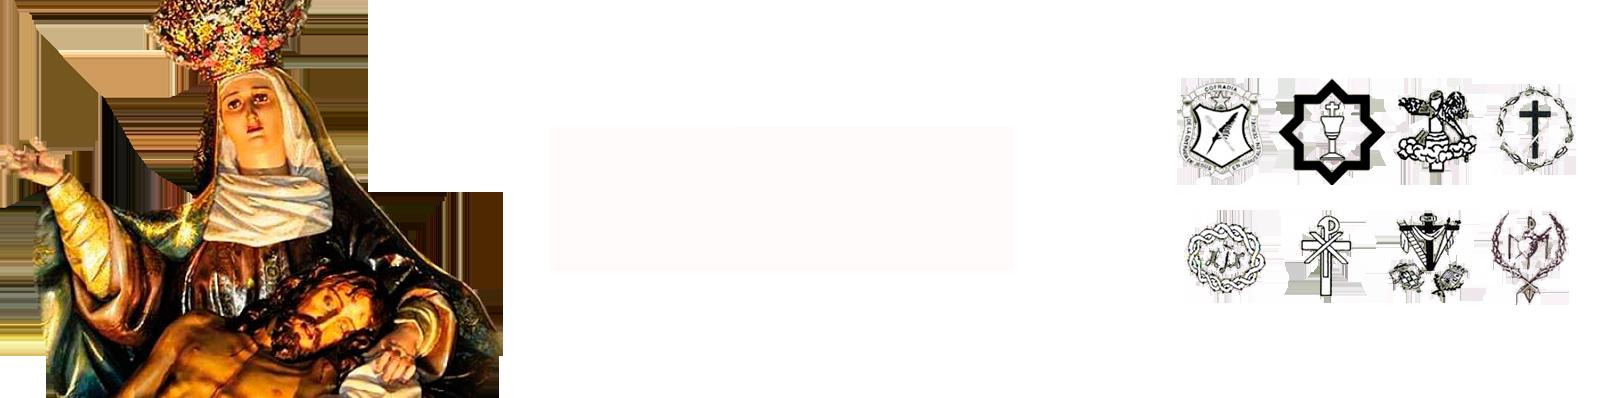 Semana Santa de Teruel 2014